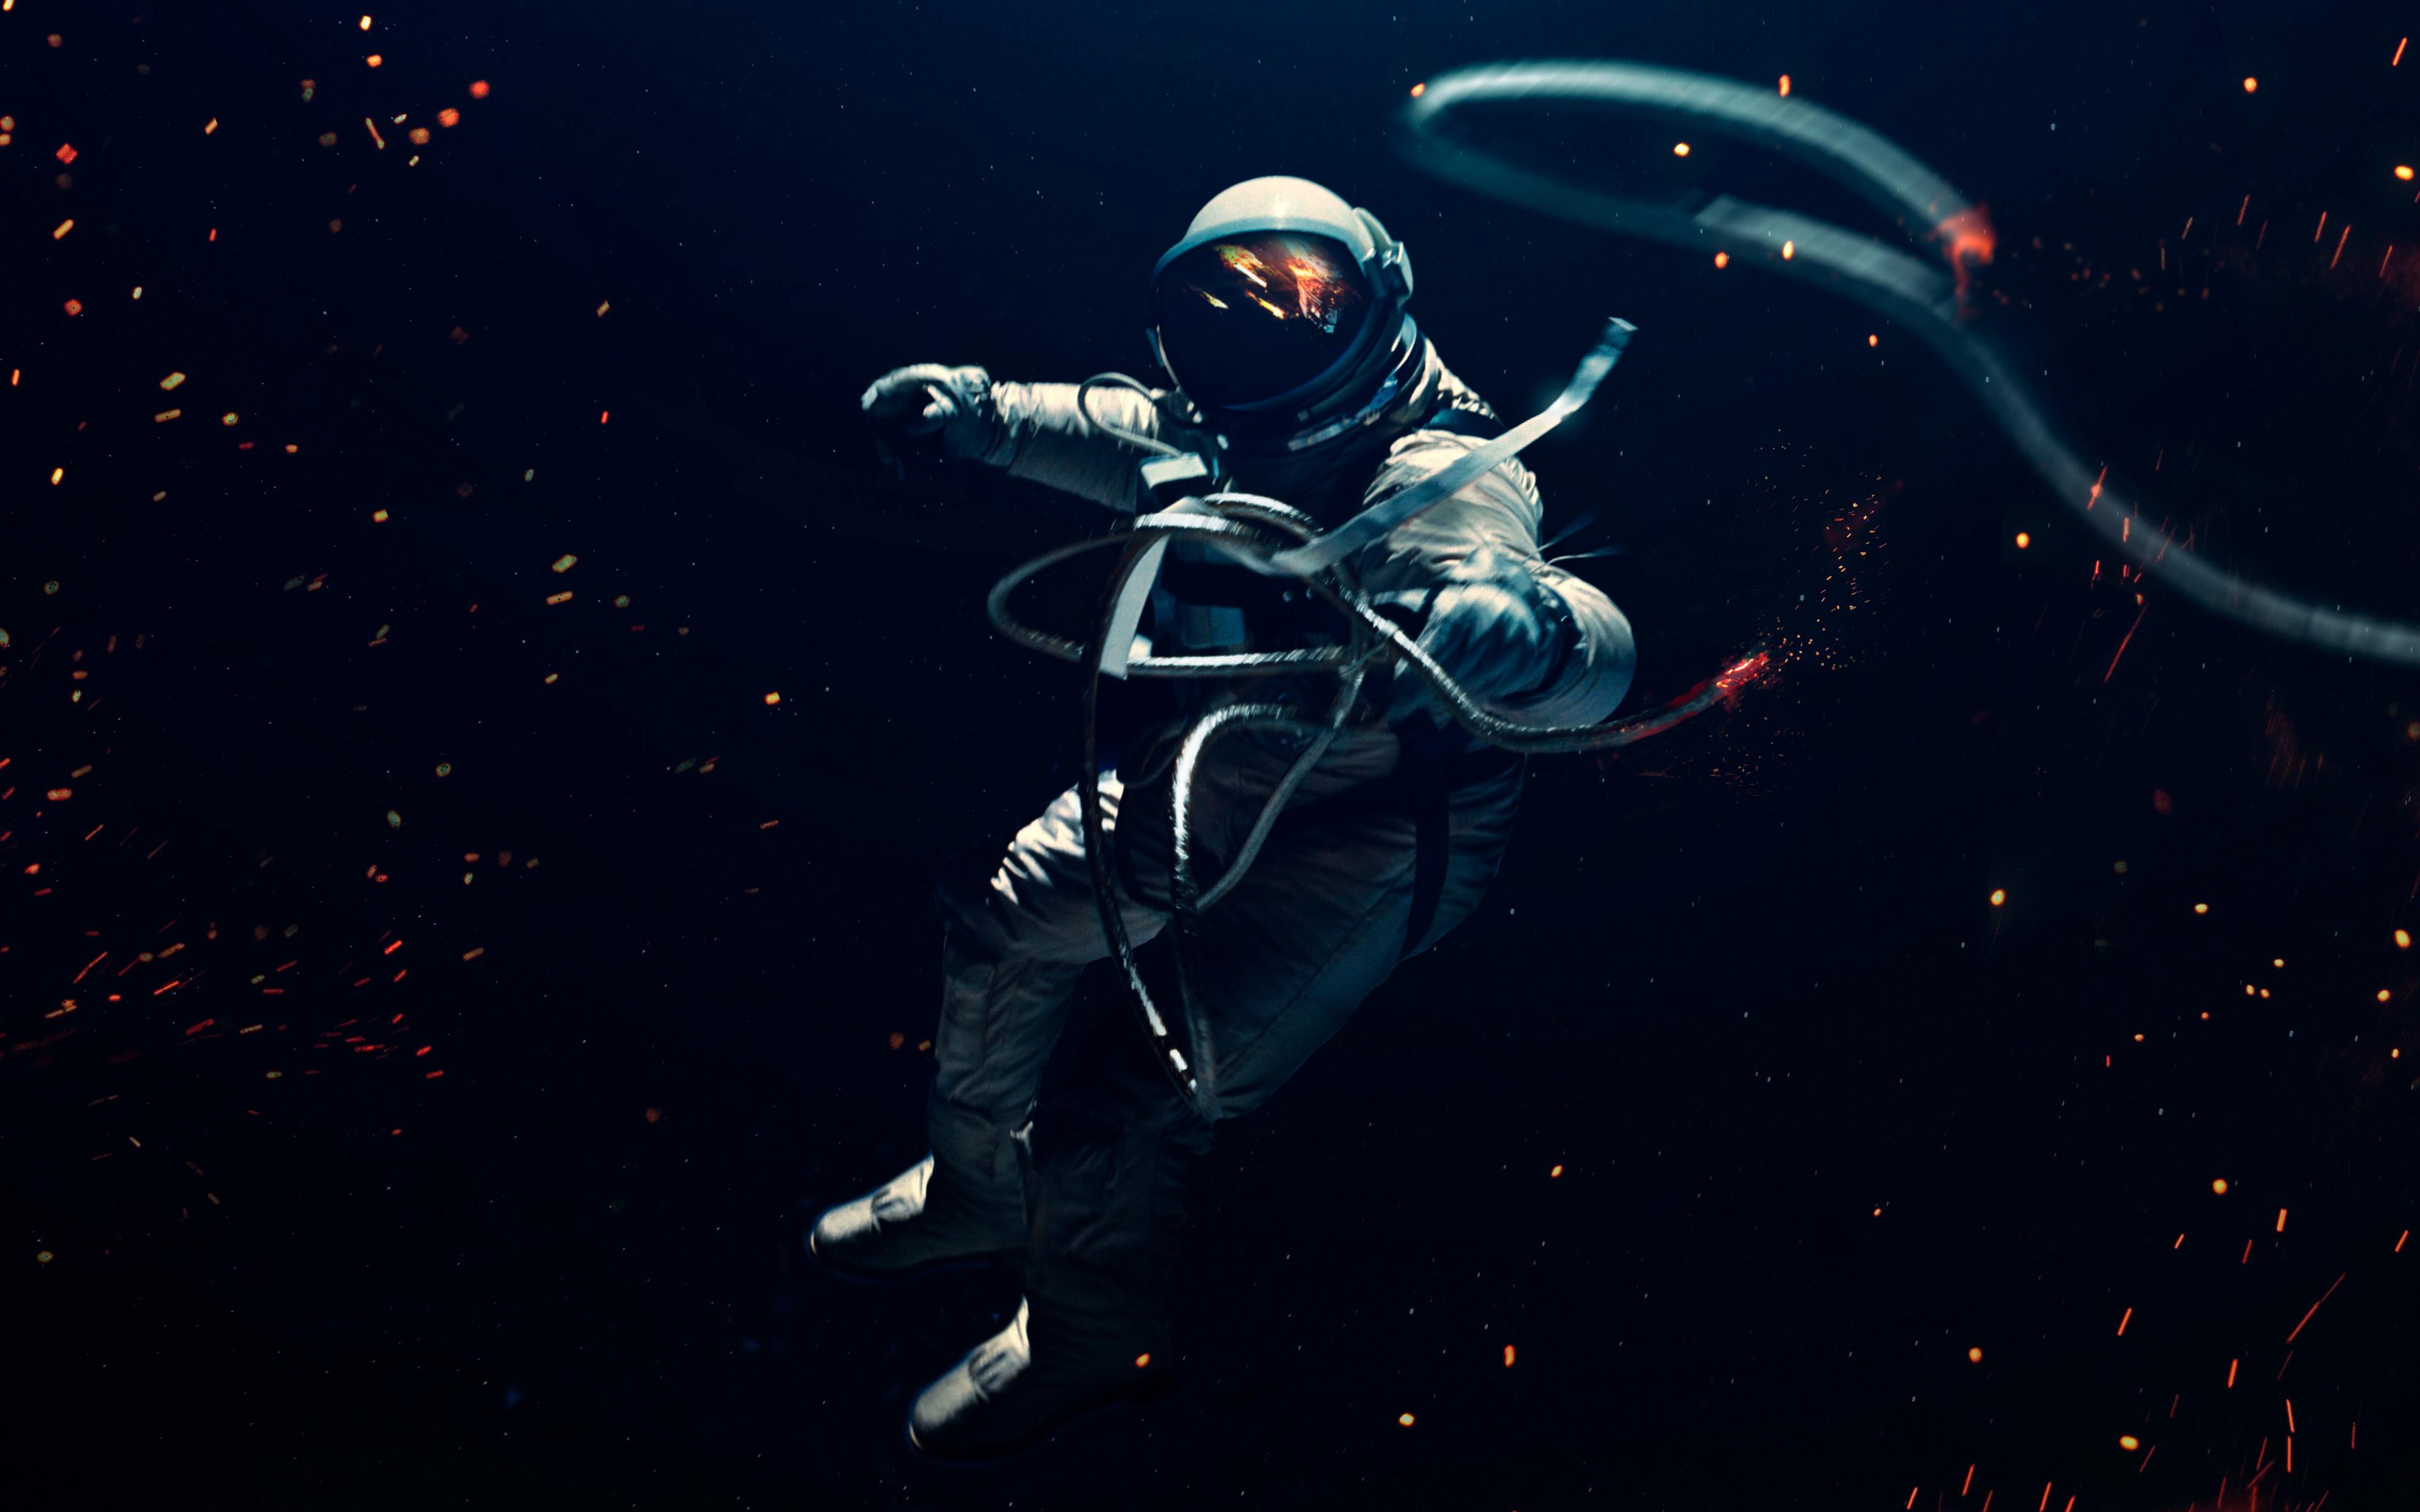 Astronaut 4k Wallpaper Space Suit Dark Background Lost In Space Space Adventure Space 2460